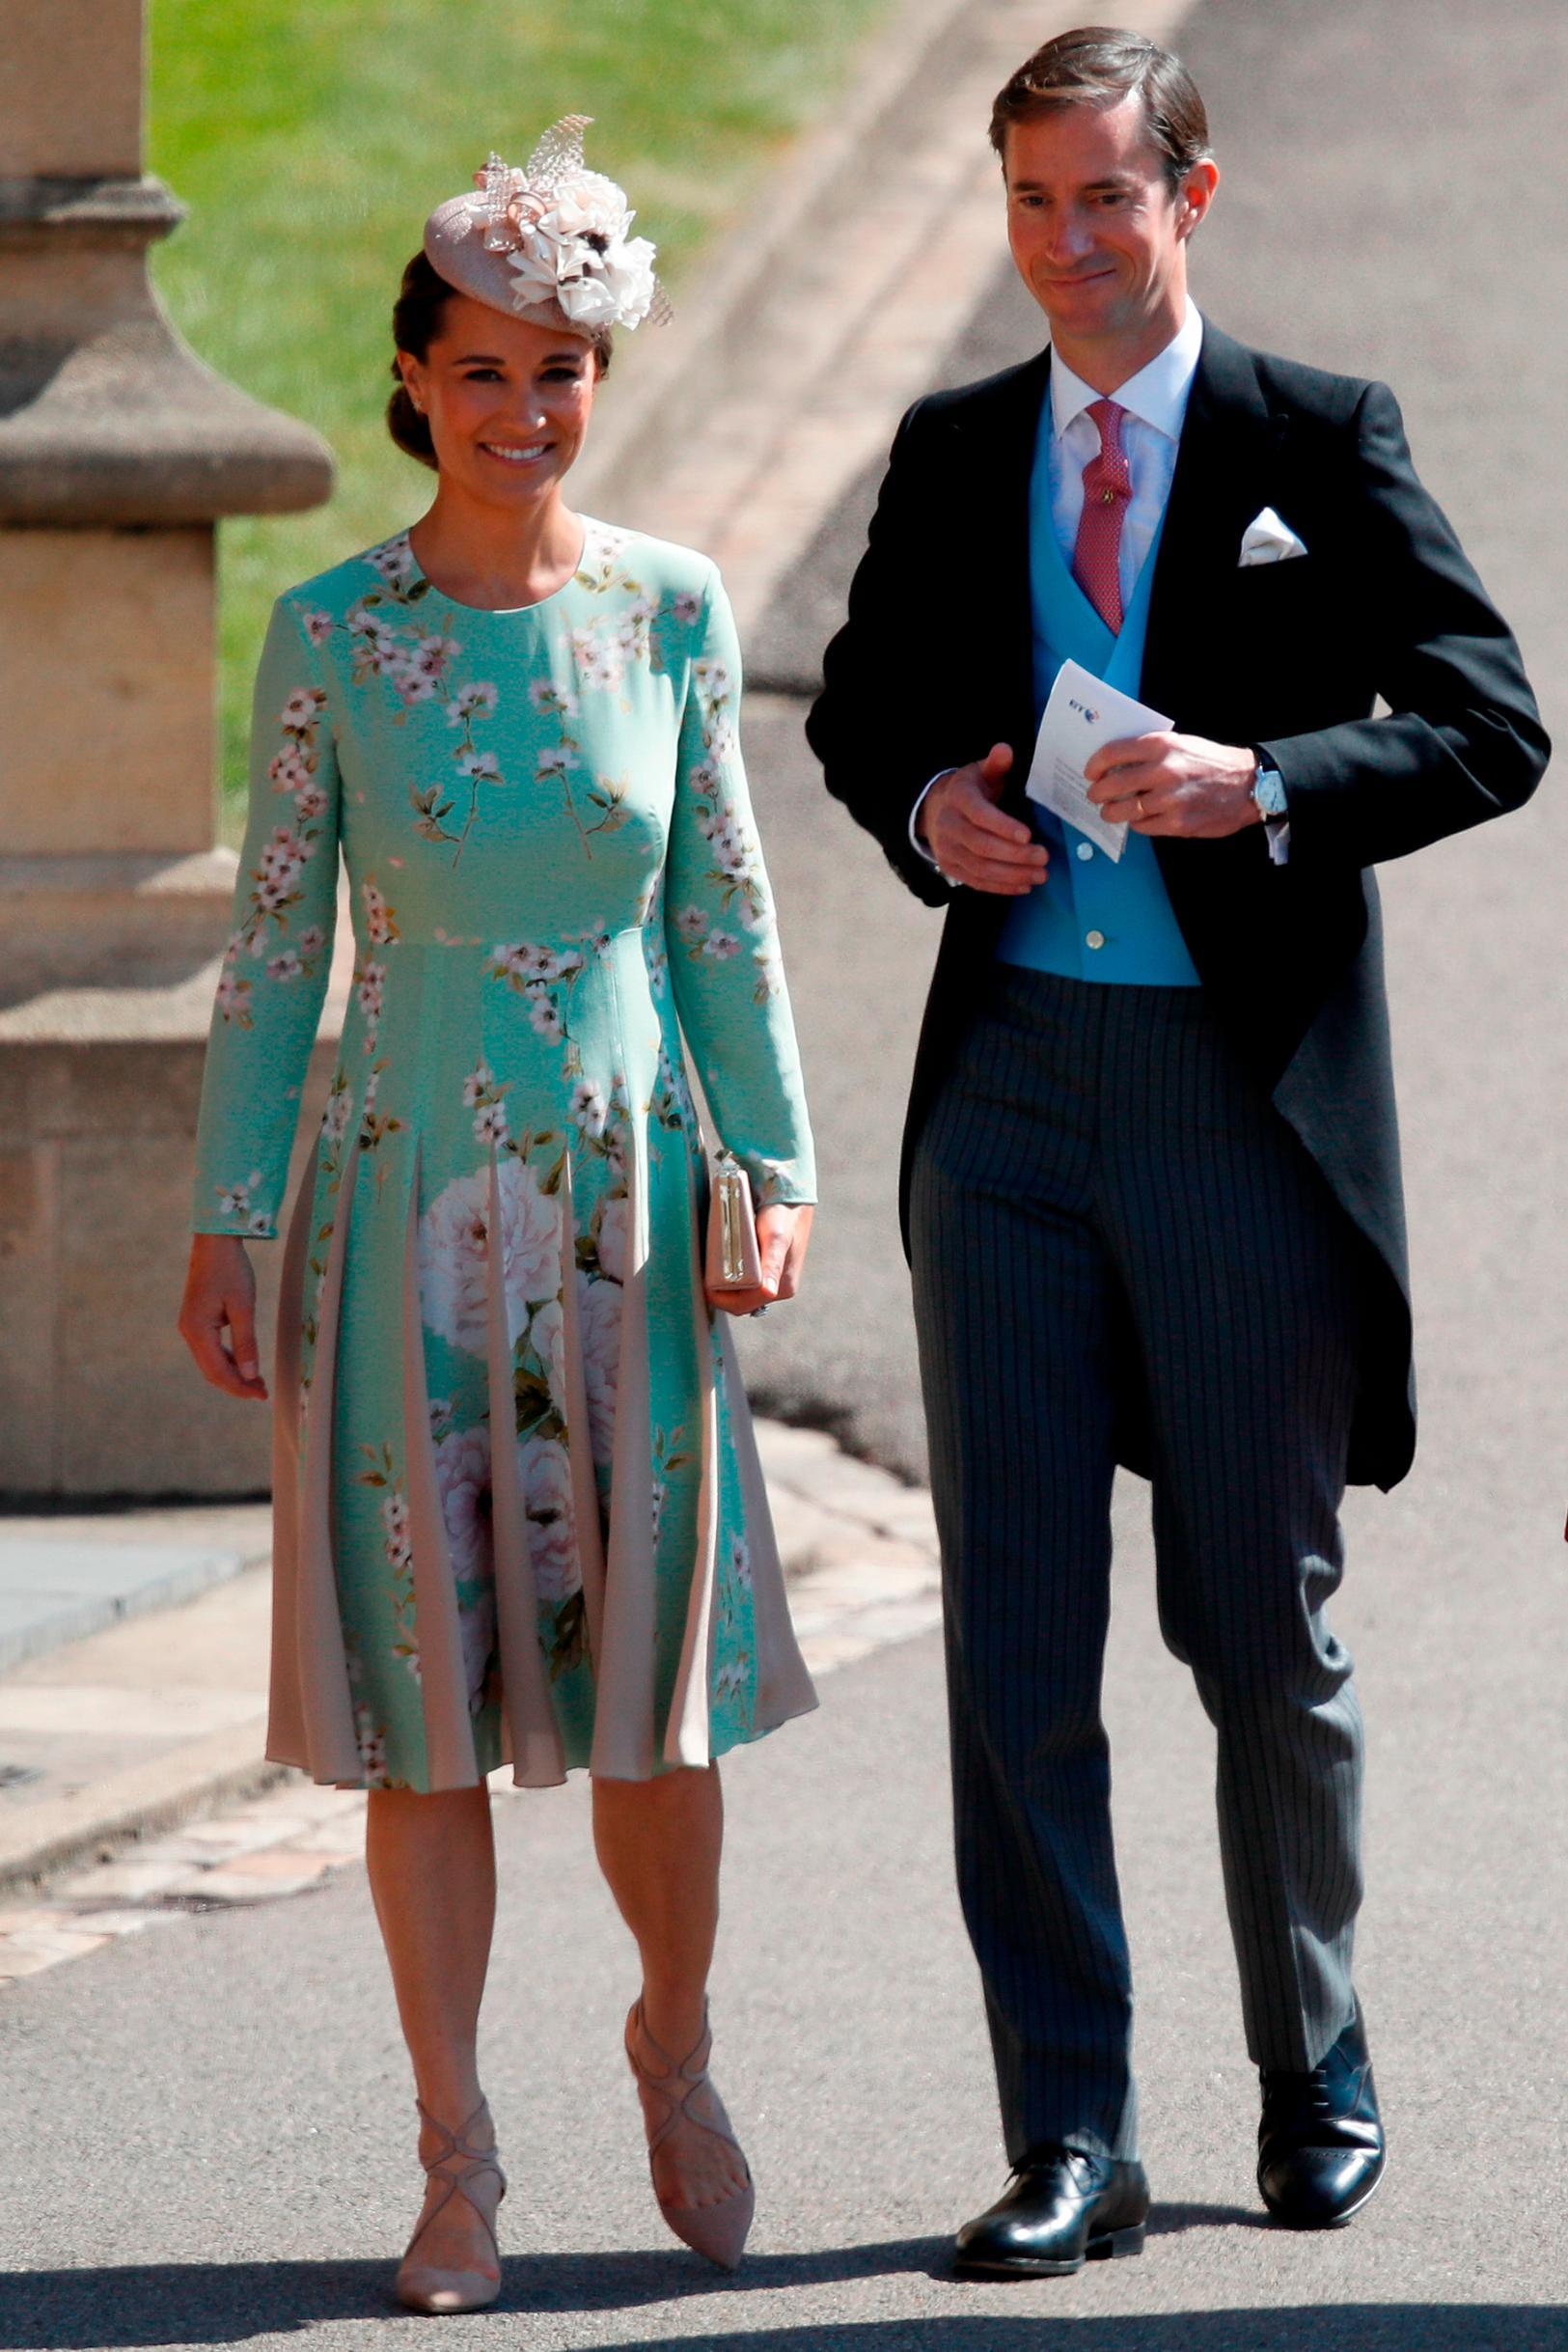 704f17fdb0e13 Wedding guest fashion bold and bright at Windsor - CNN Style